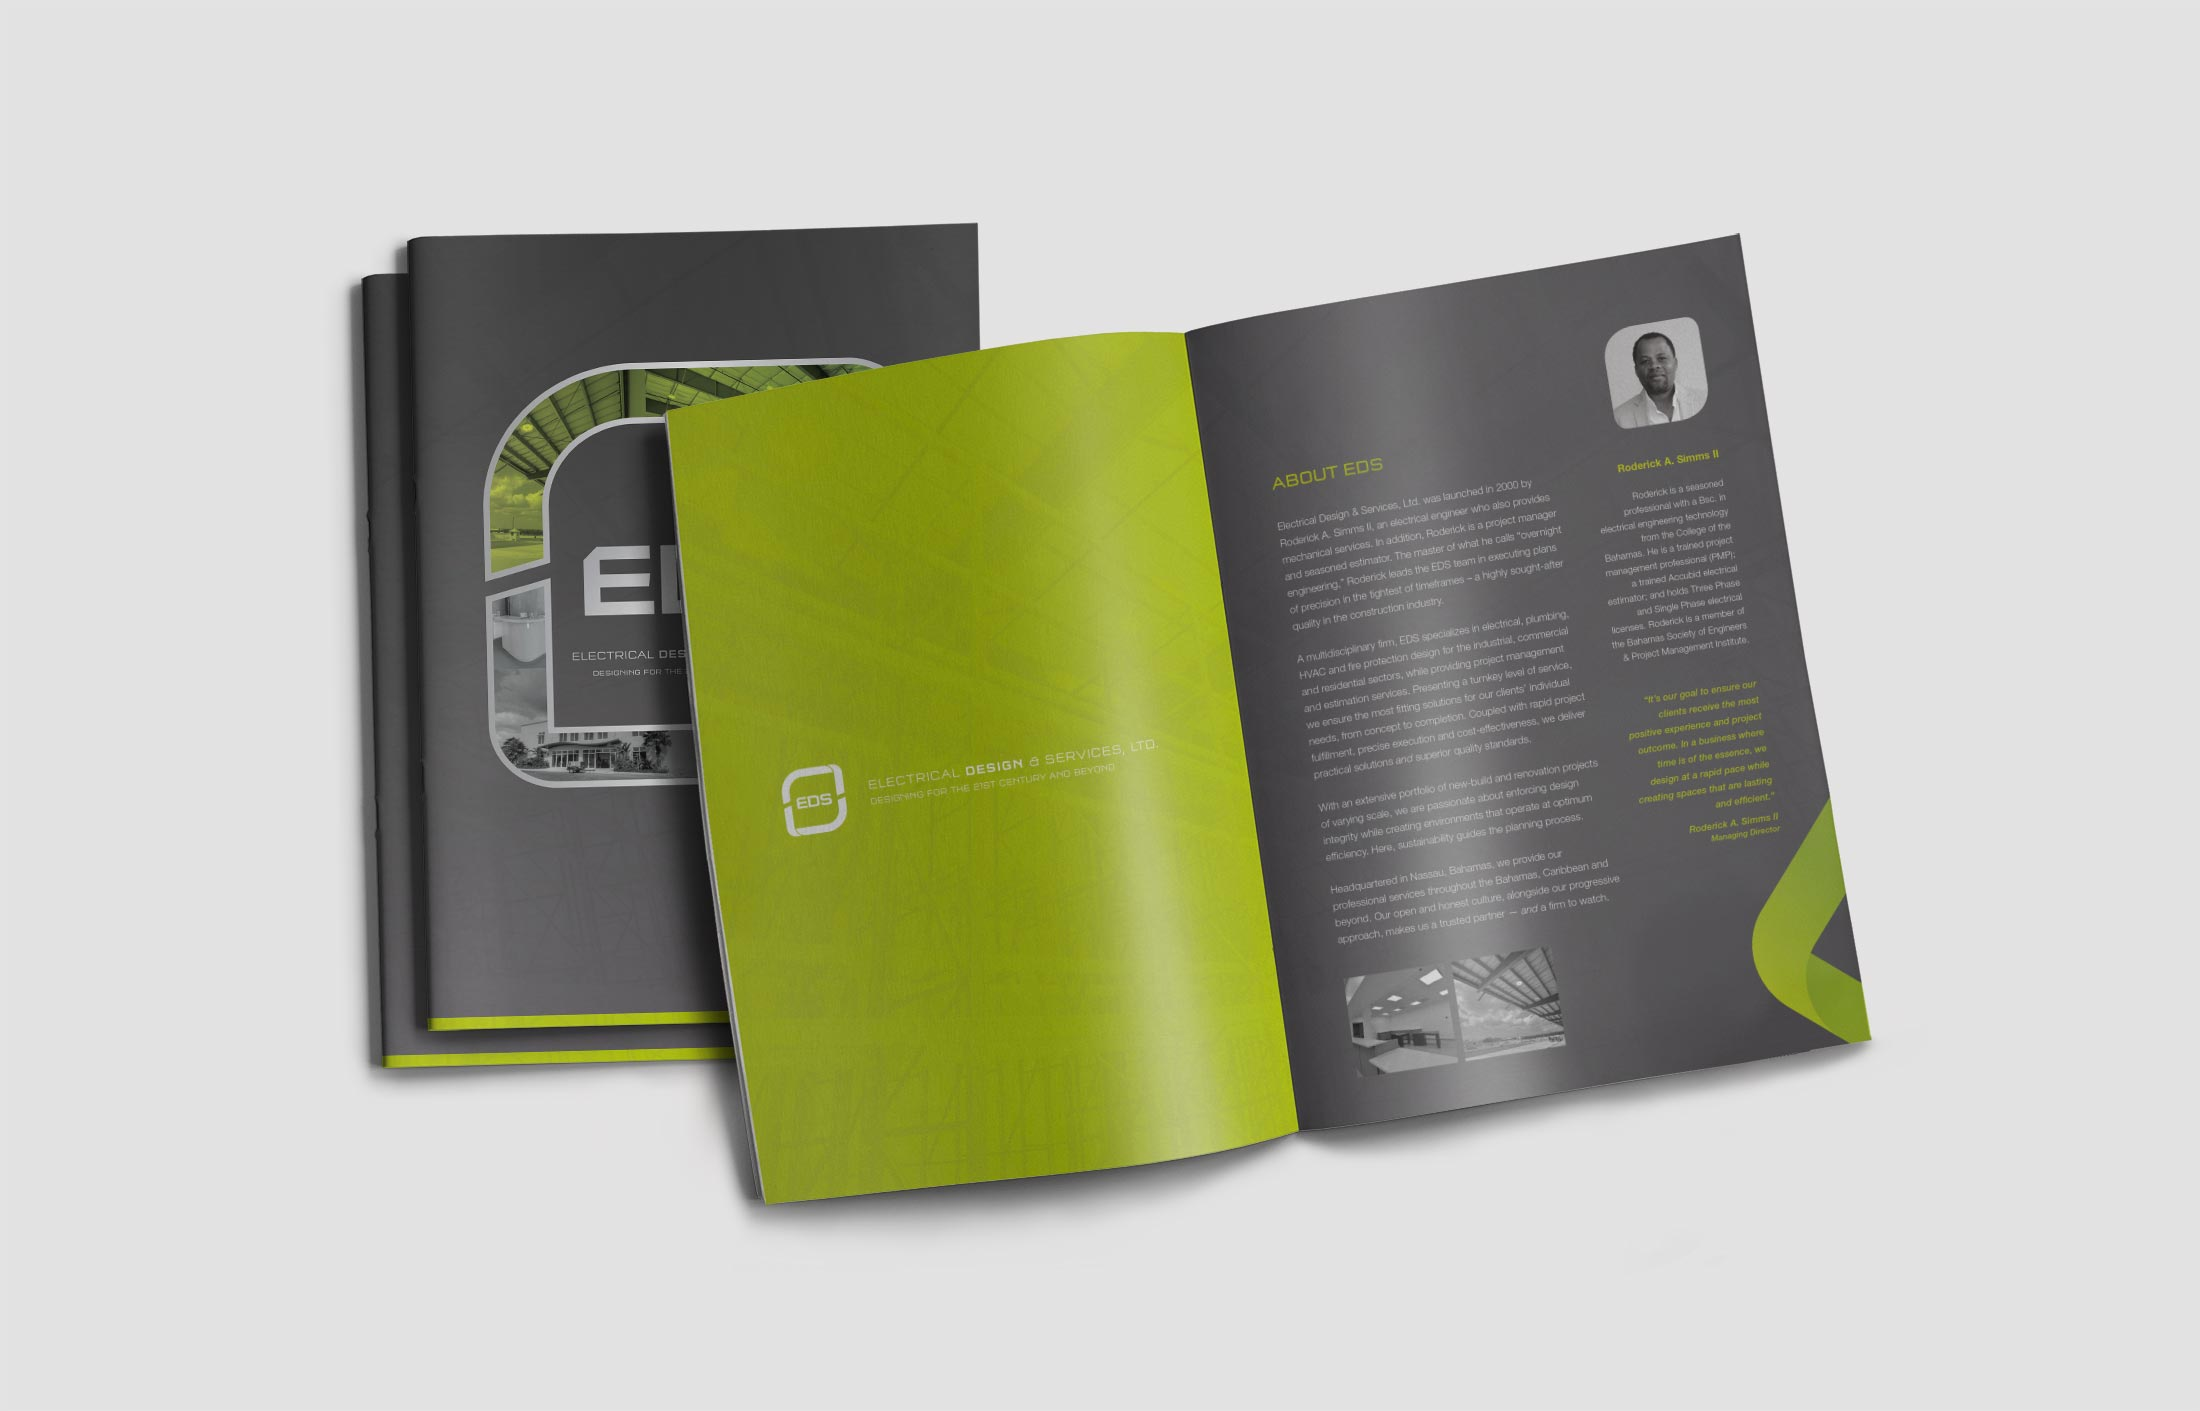 eds brochure dossier